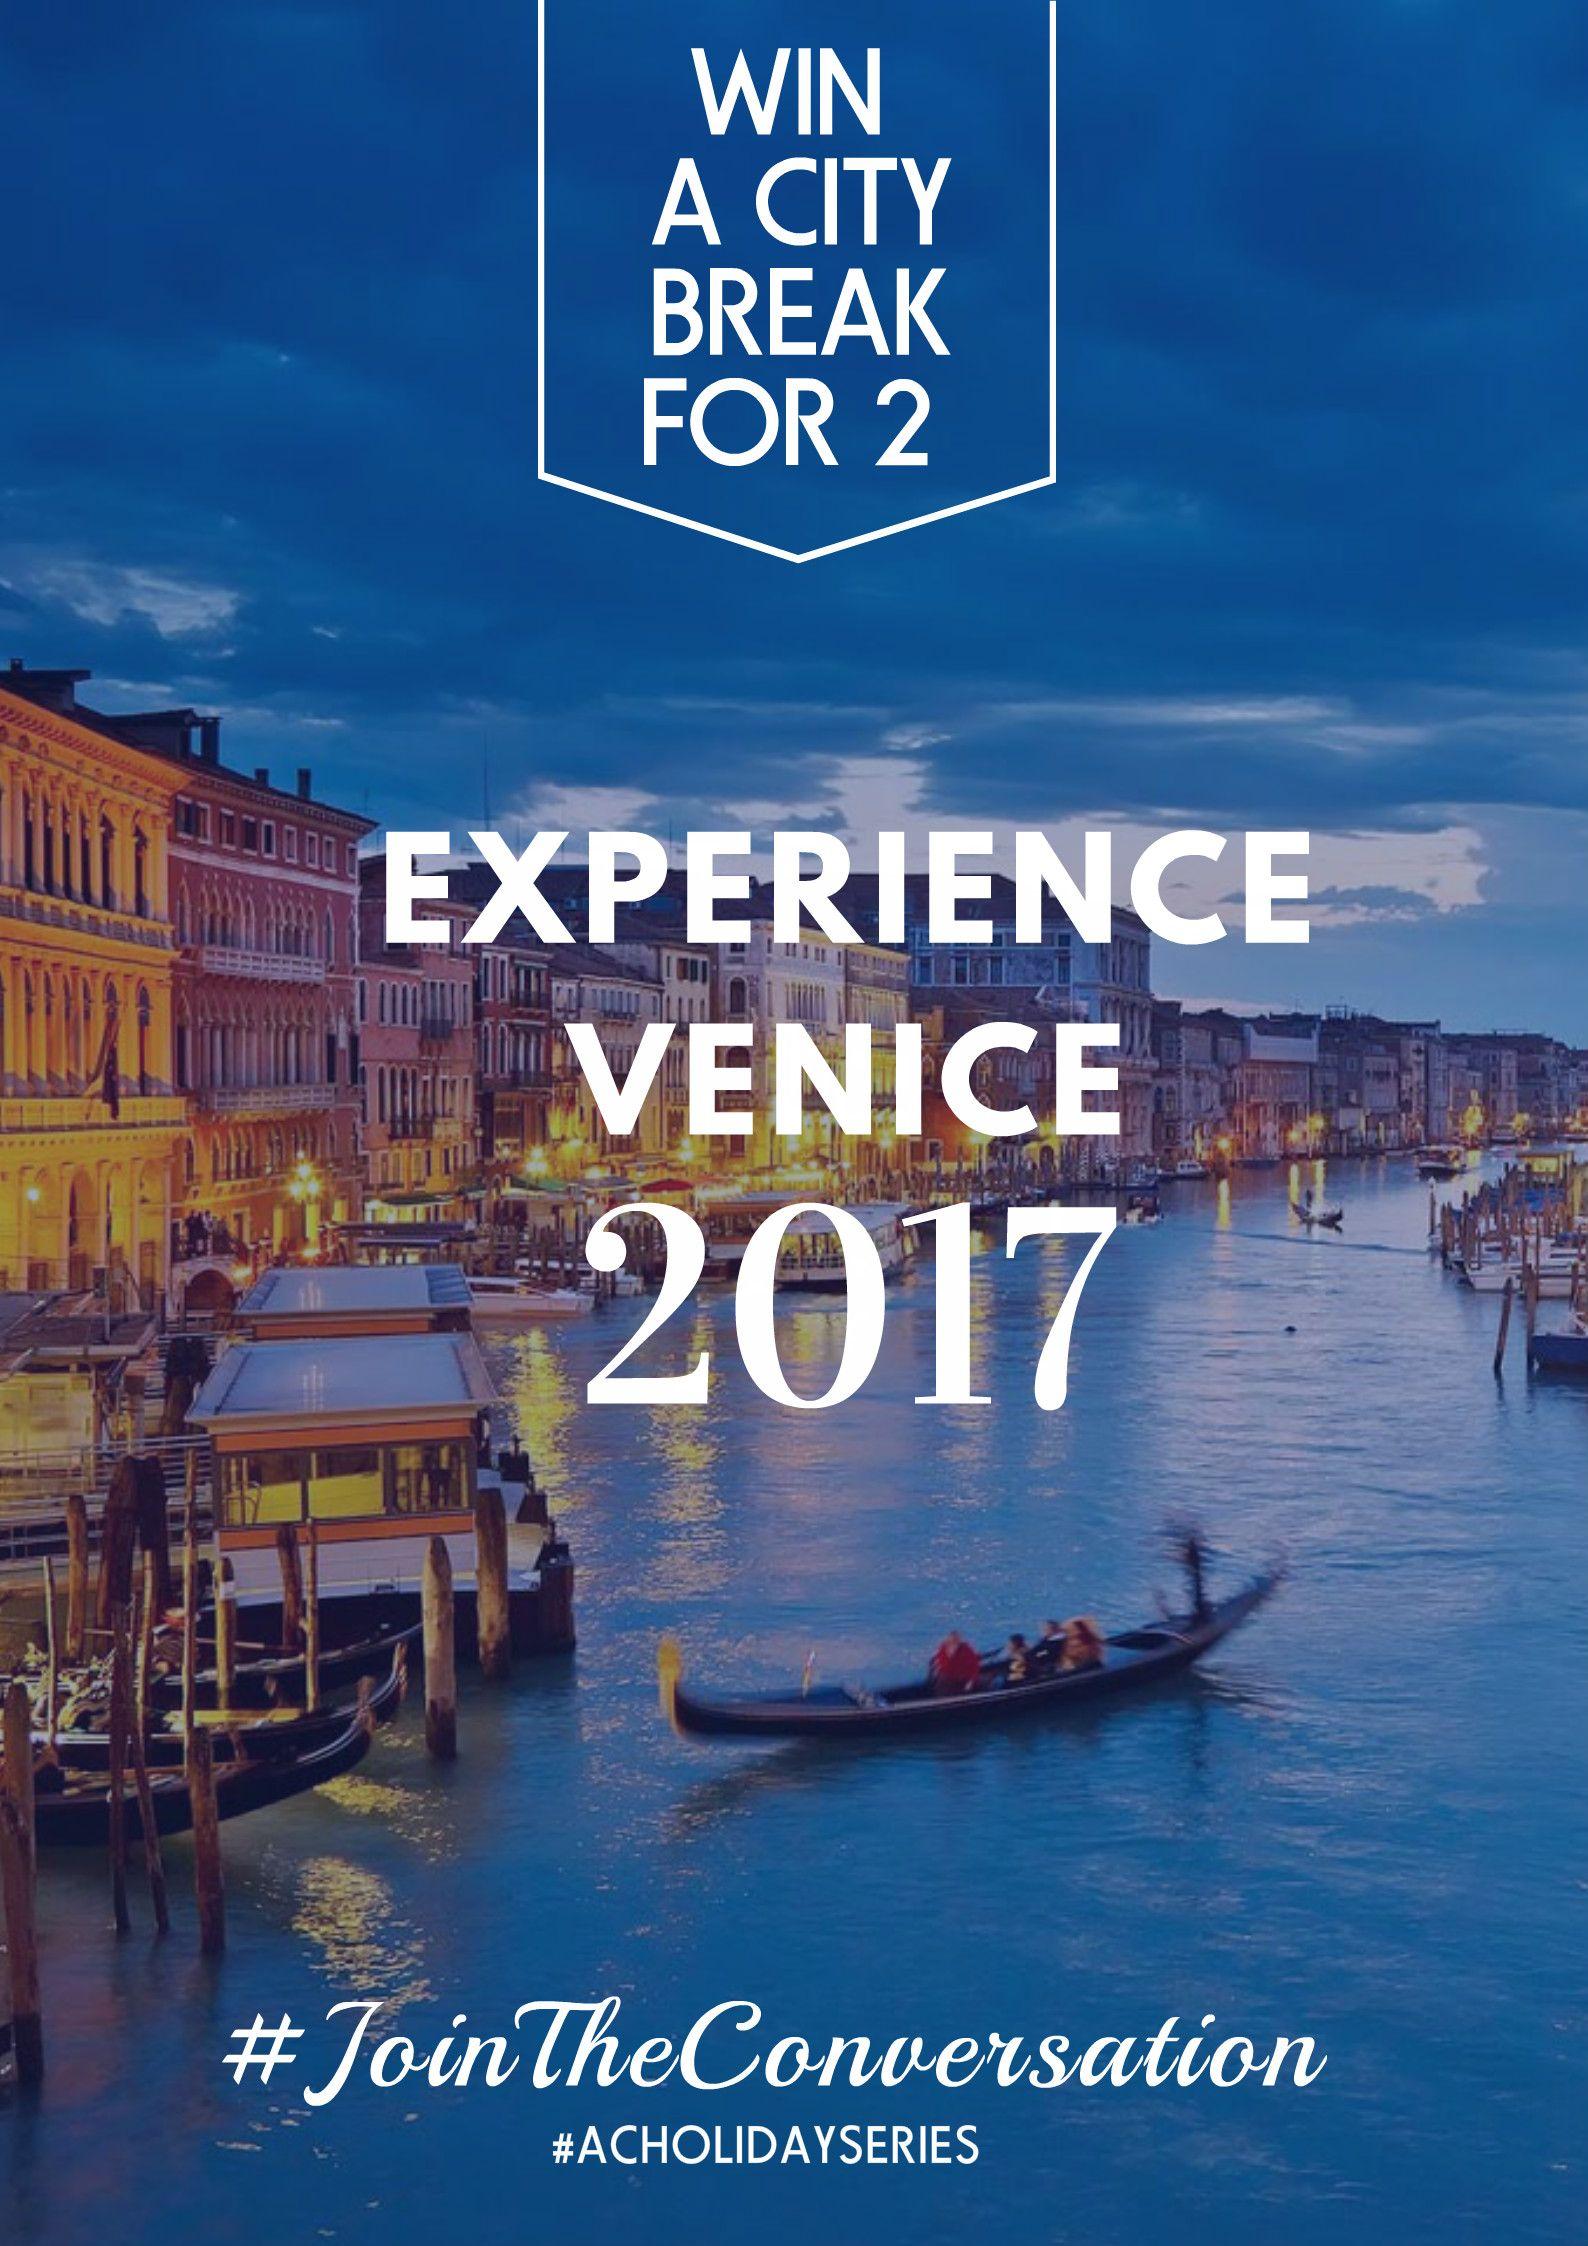 XMAS: Win a city break for 2 in Venice